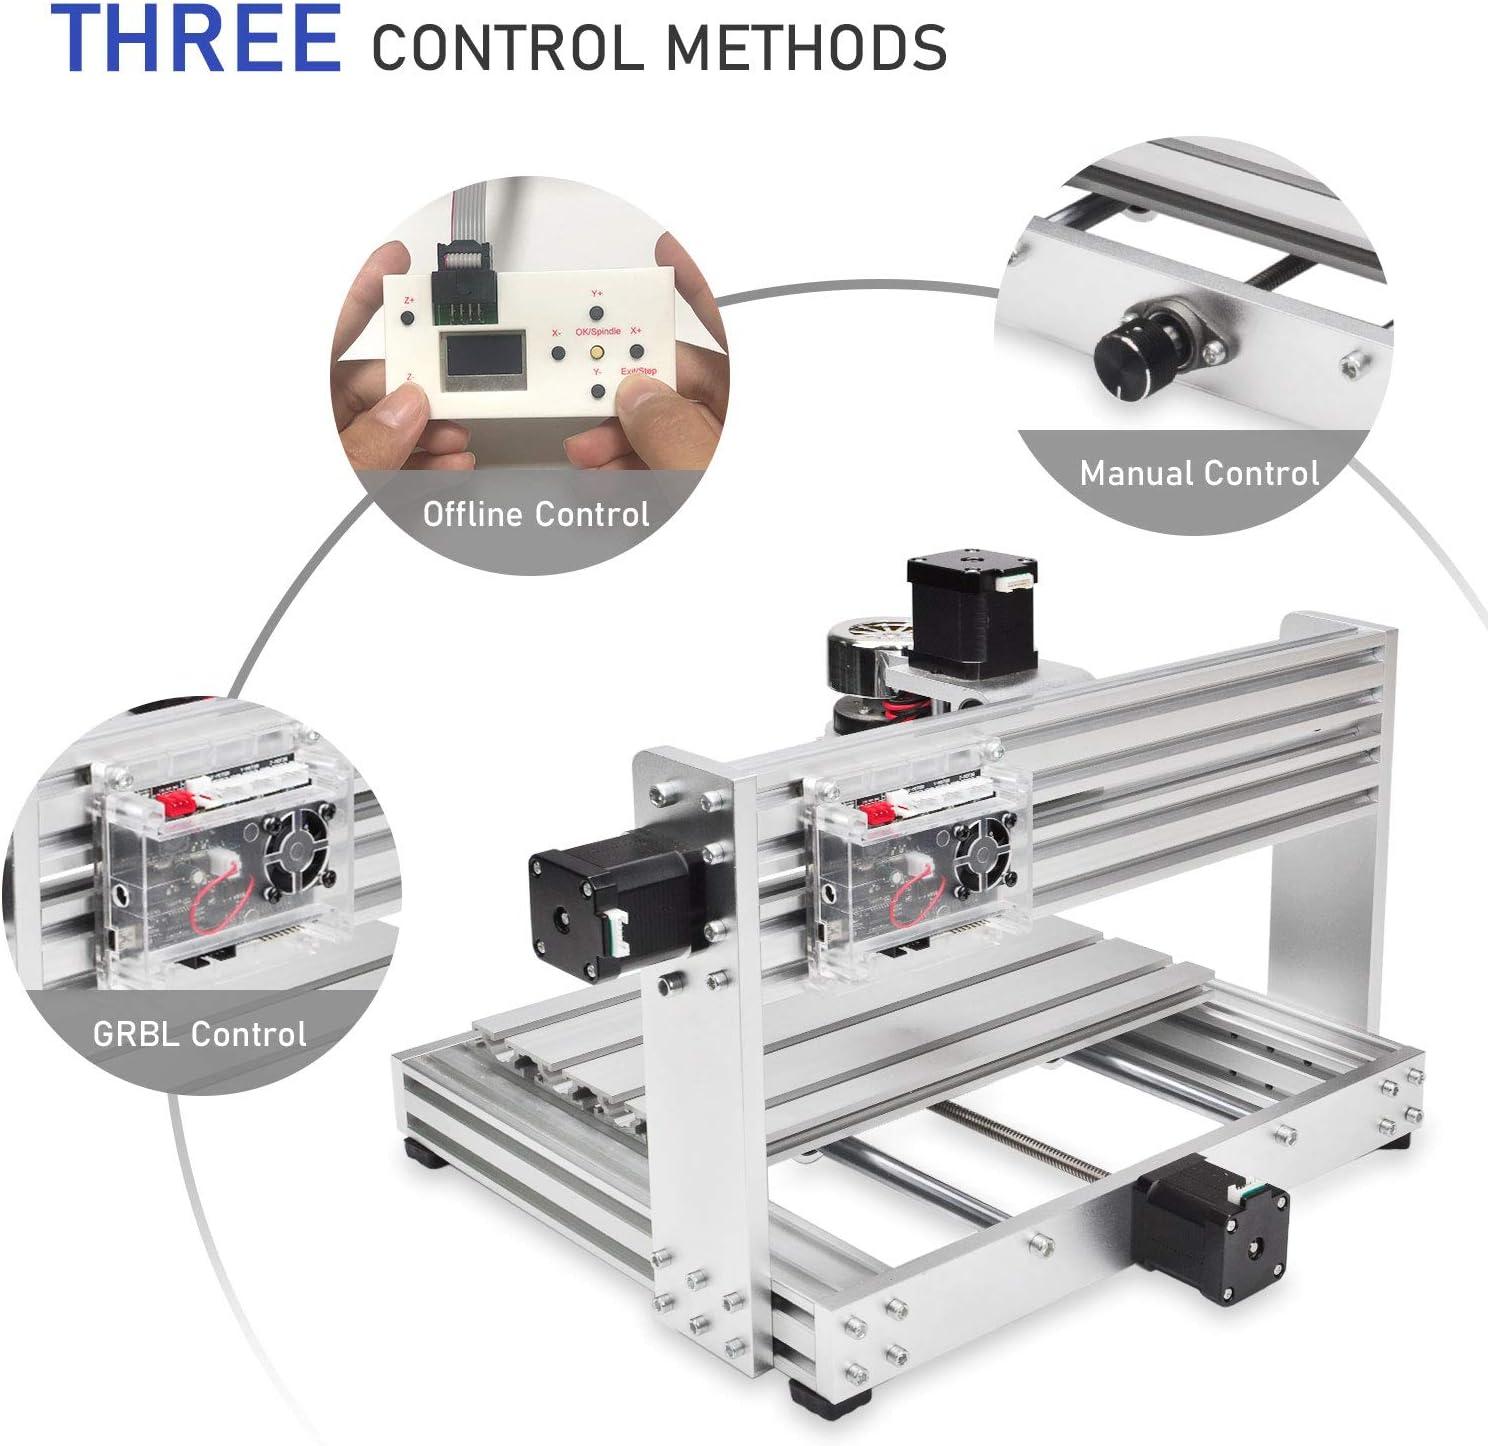 3018-Max DAEDALUS CNC 3018-Max Machine 3 Axis GRBL Control with ...